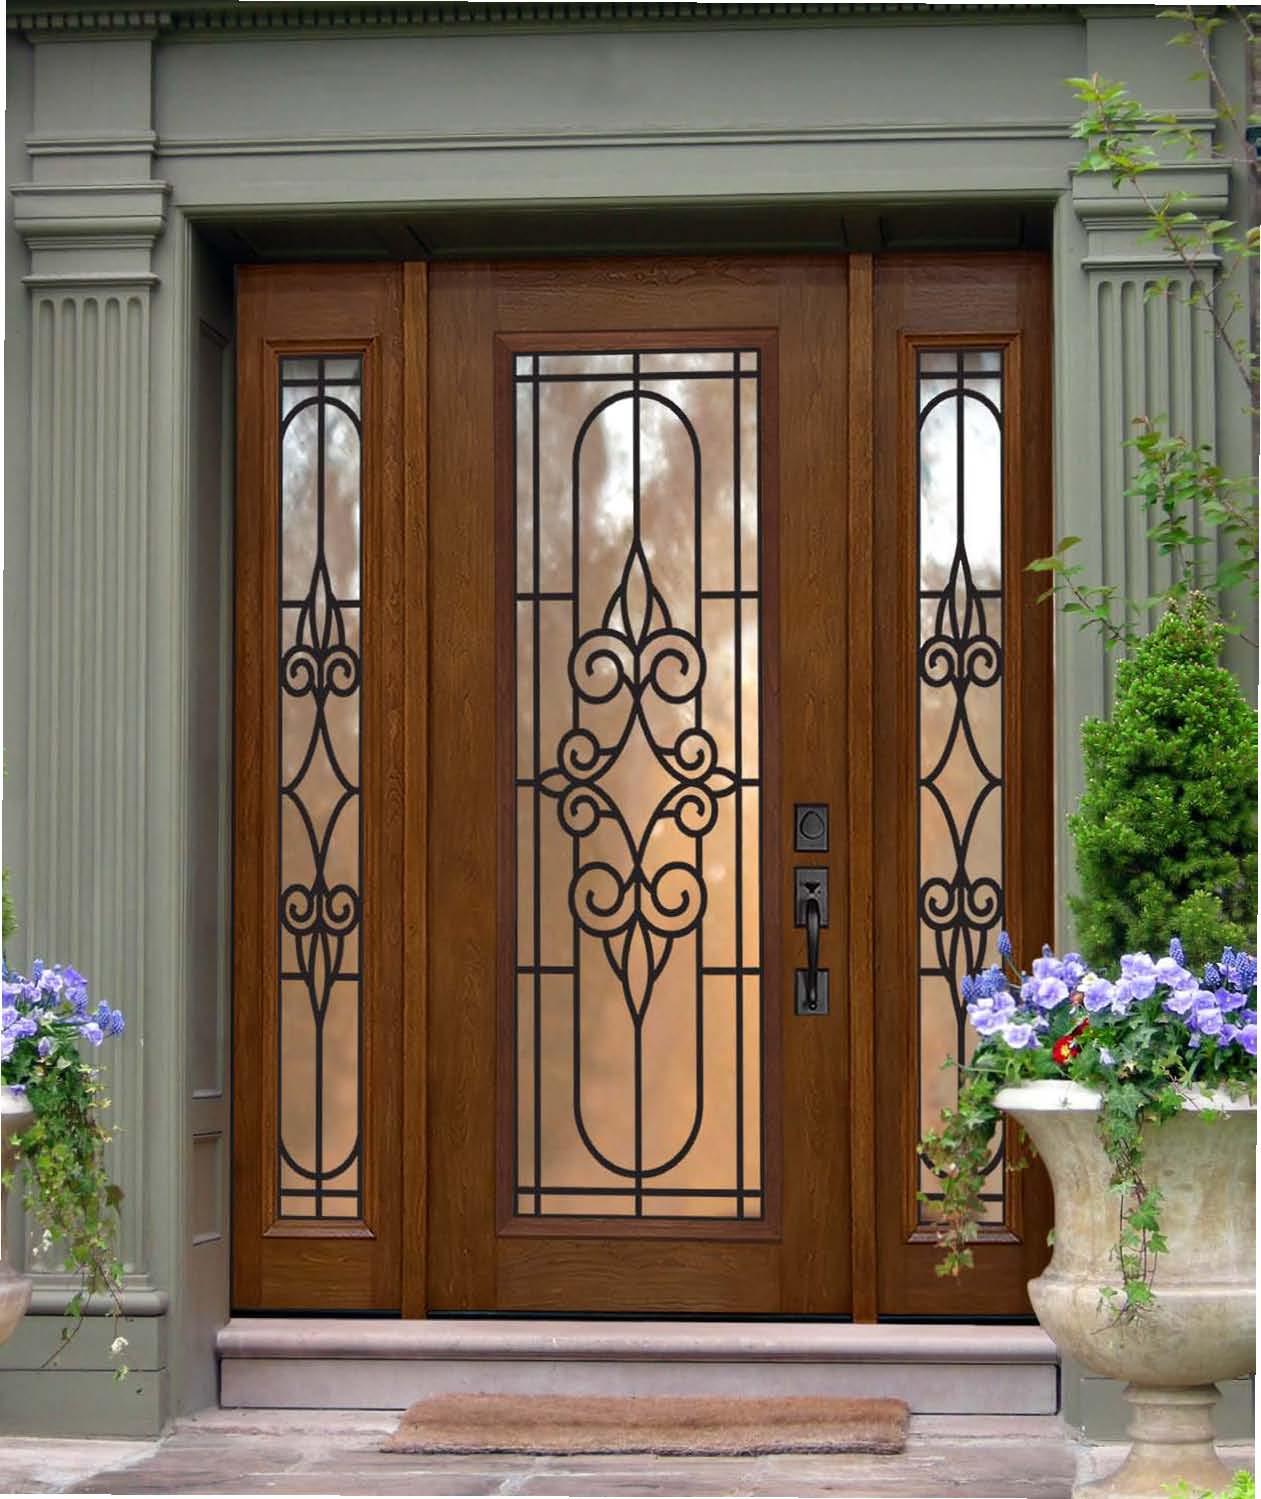 US Door and More Inc.: Make your Entry door trendy with